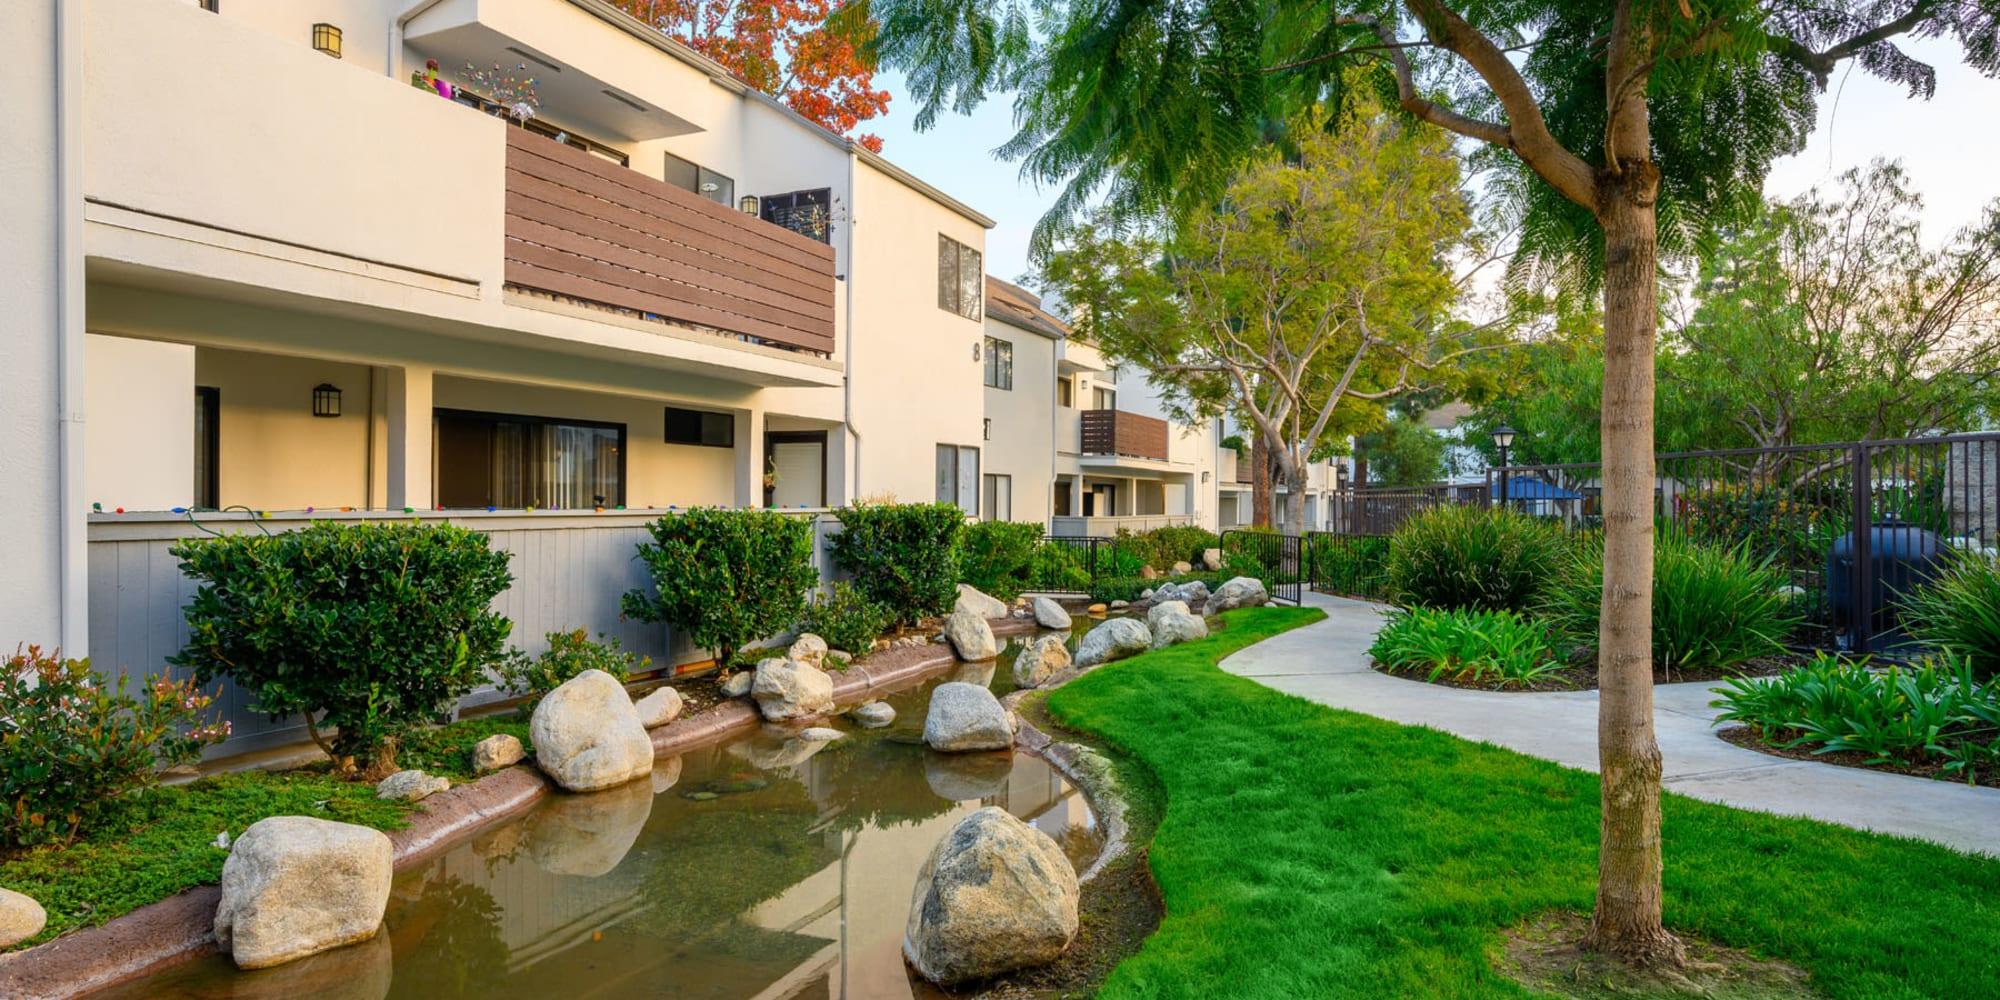 Lush green grass and a small pond outside resident buildings at Sendero Huntington Beach in Huntington Beach, California